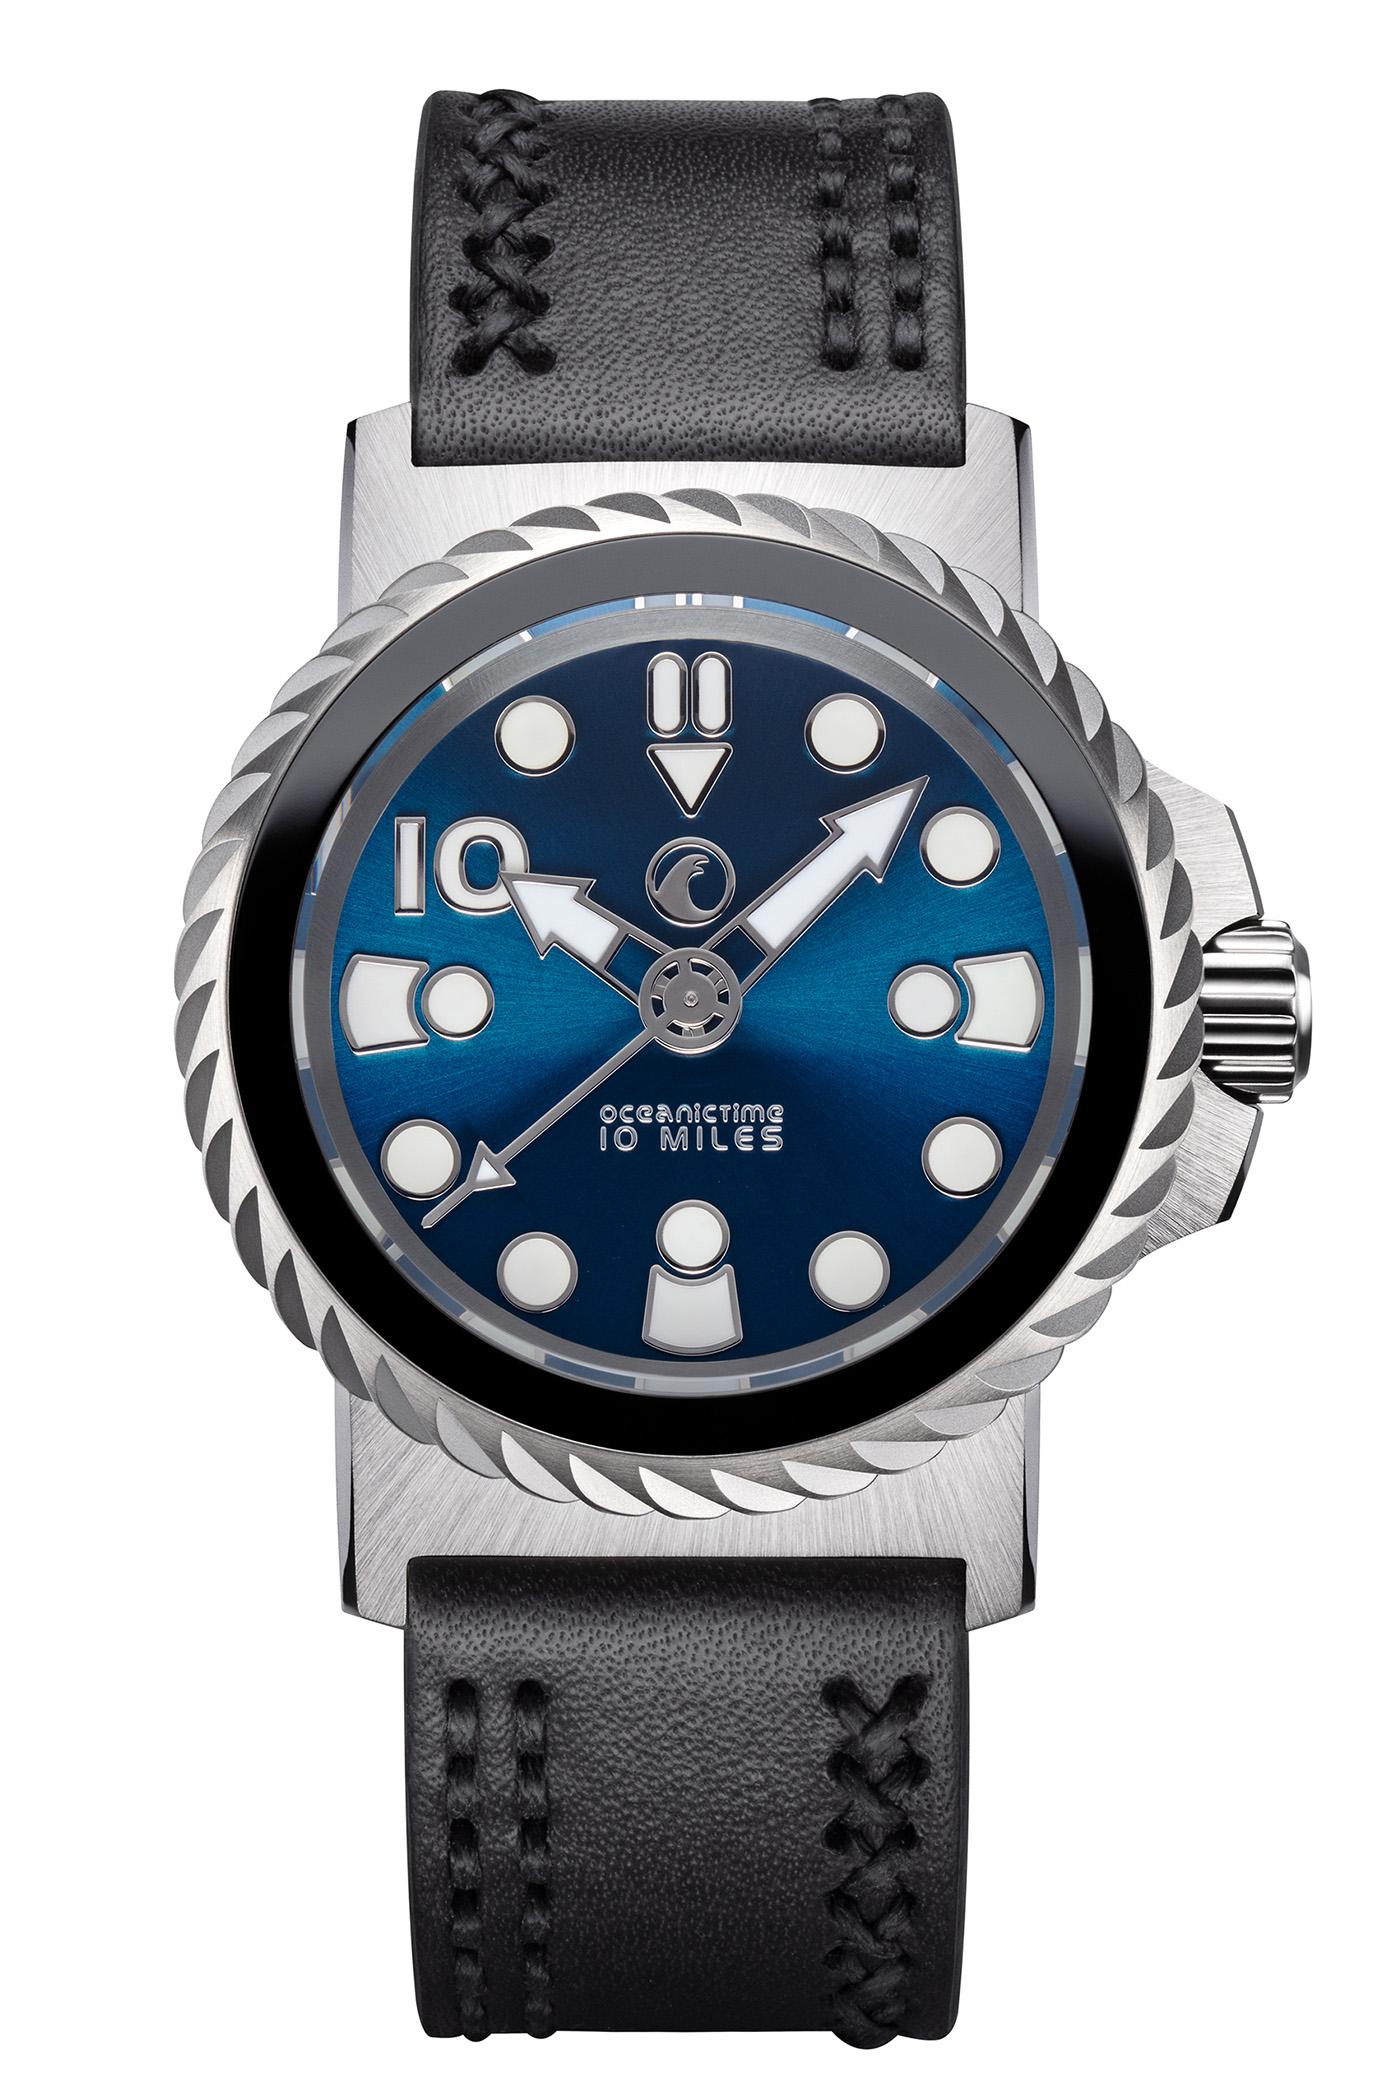 H2O Watch Kalmar 10 Miles - 9